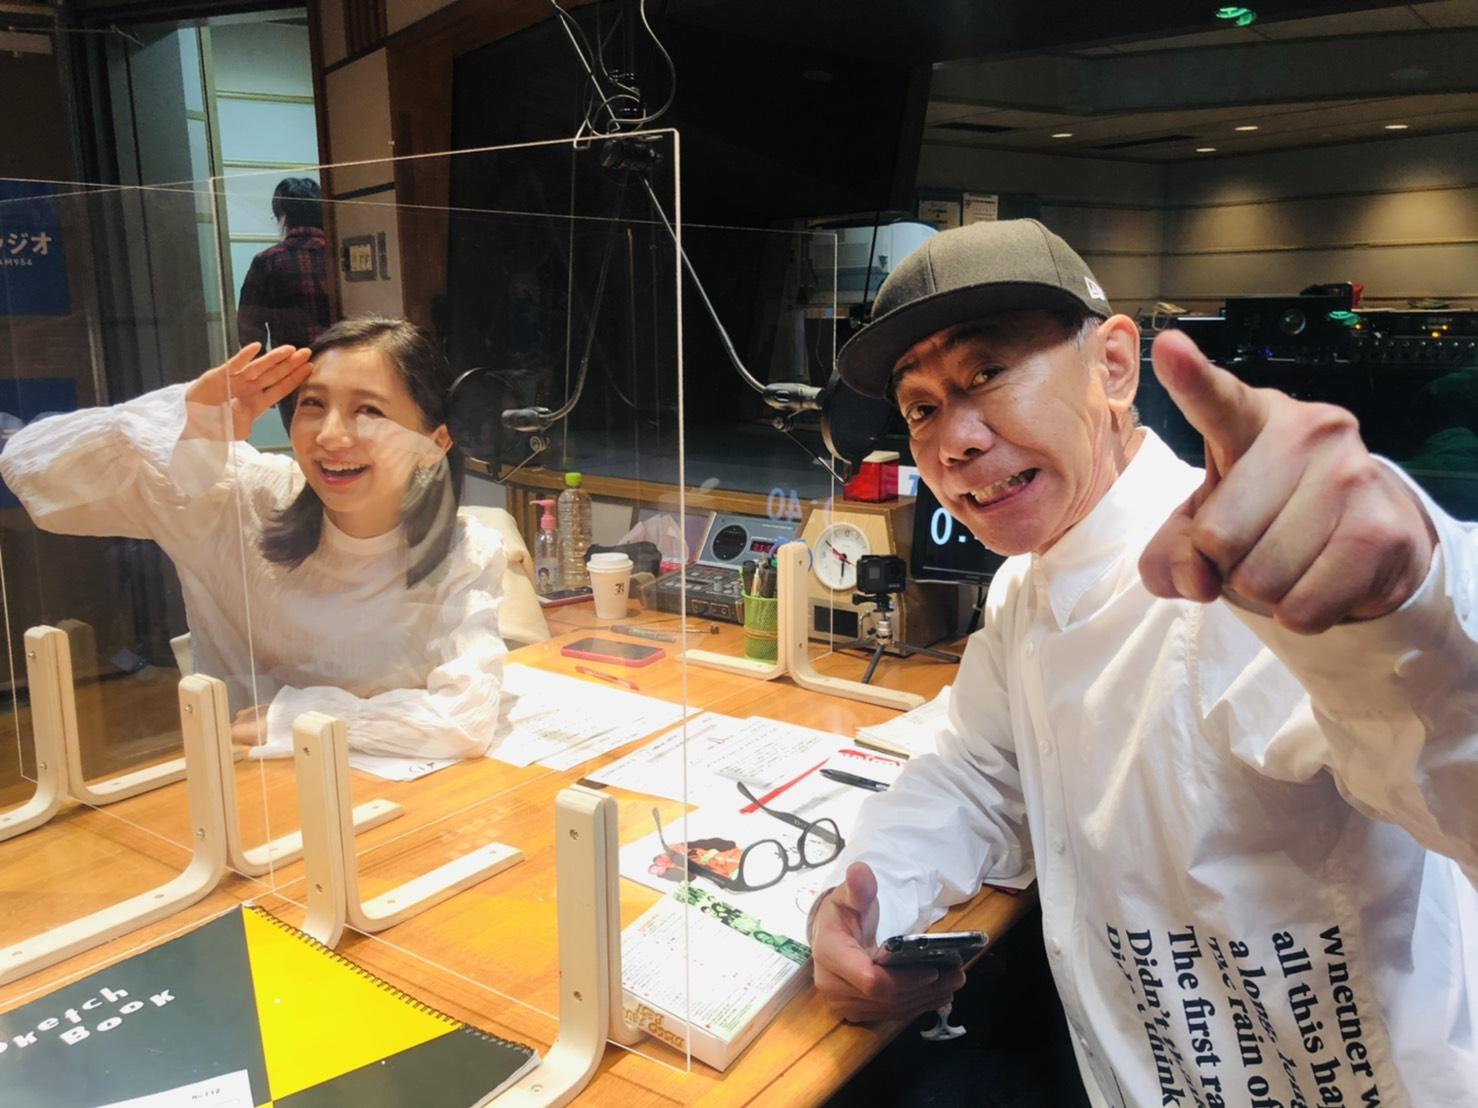 TBS★近藤夏子 Vol.2★はやドキ! BLITZ POWER PUSH YouTube動画>10本 ->画像>194枚